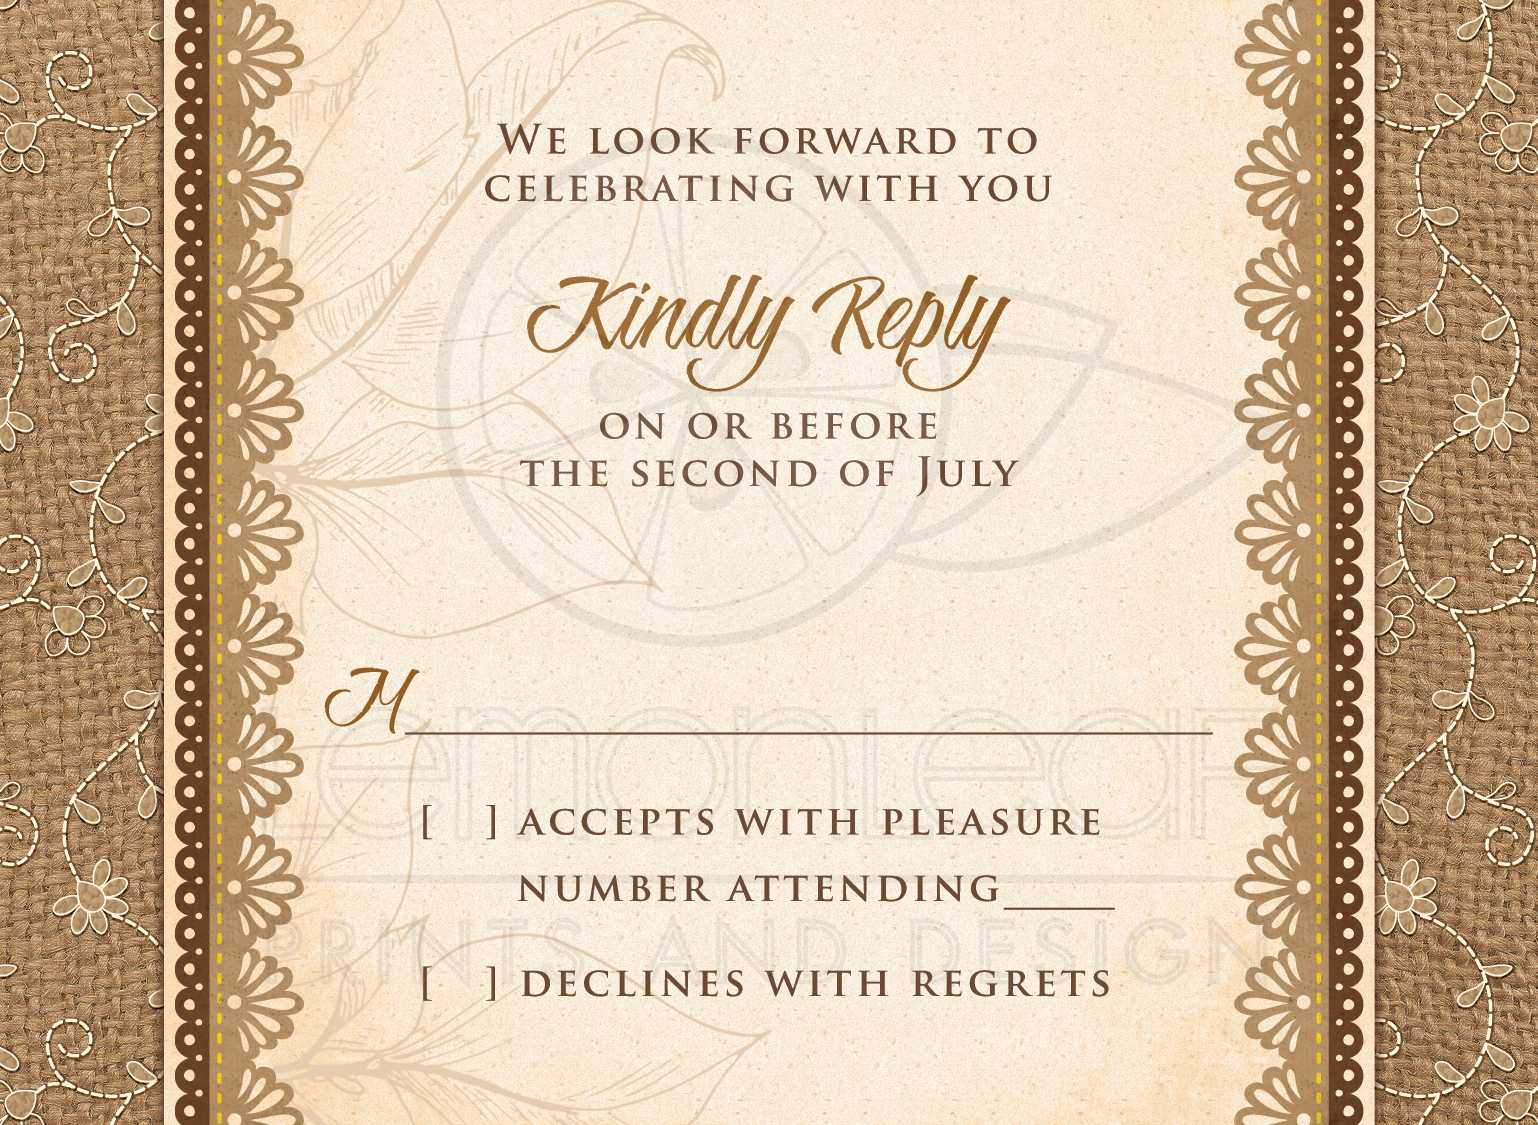 Wedding RSVP Card Rustic Burlap Lace Wood